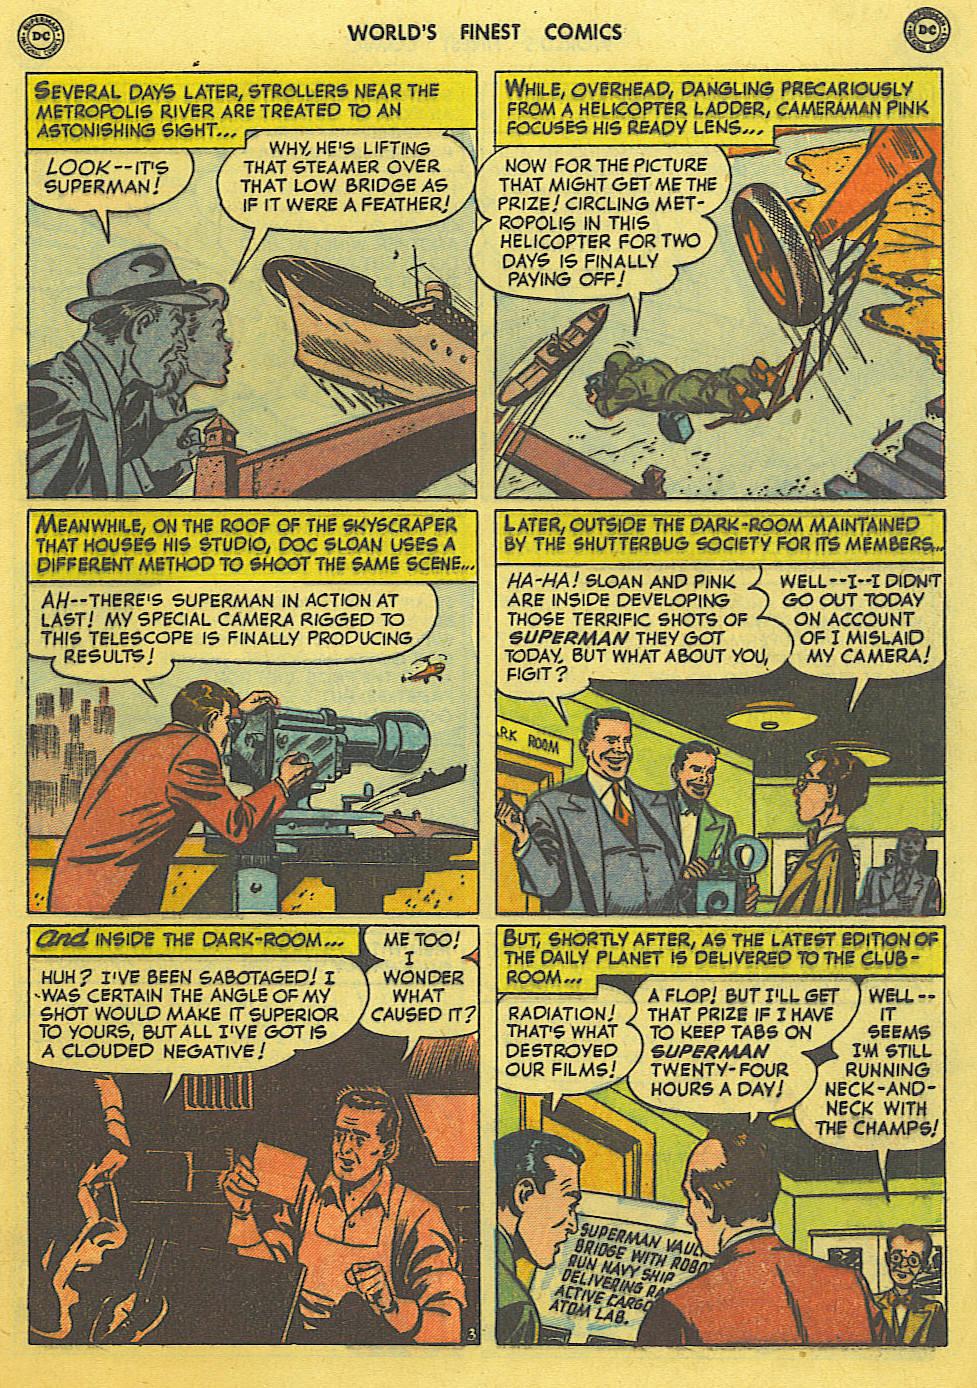 Read online World's Finest Comics comic -  Issue #49 - 5